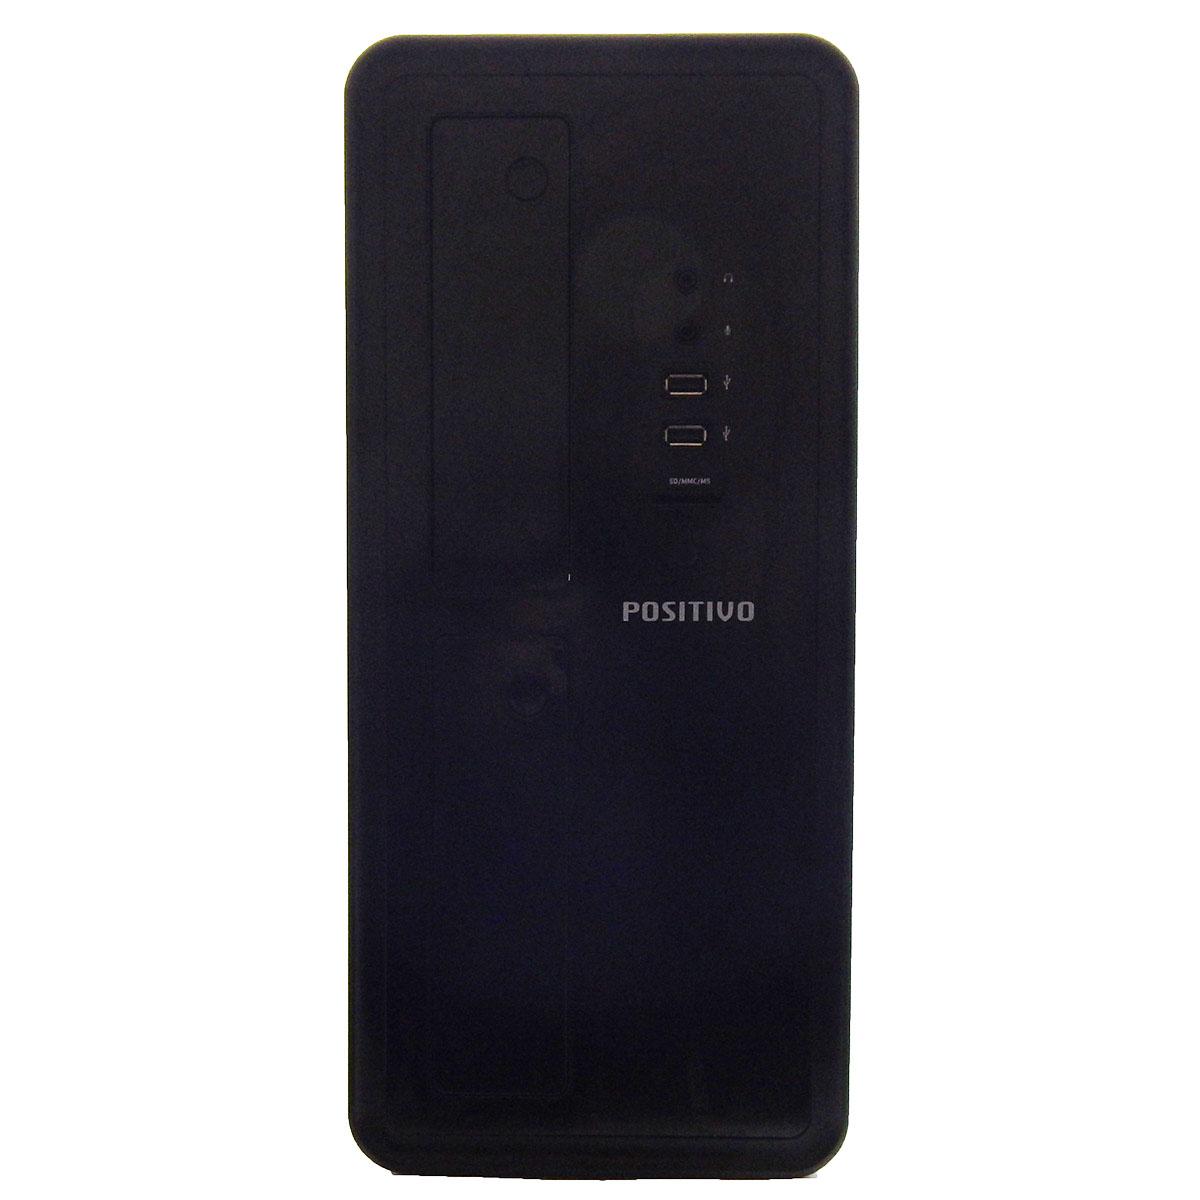 PC Positivo Premium PCTV K2960 CEL. 847/4G/500 - 1020369